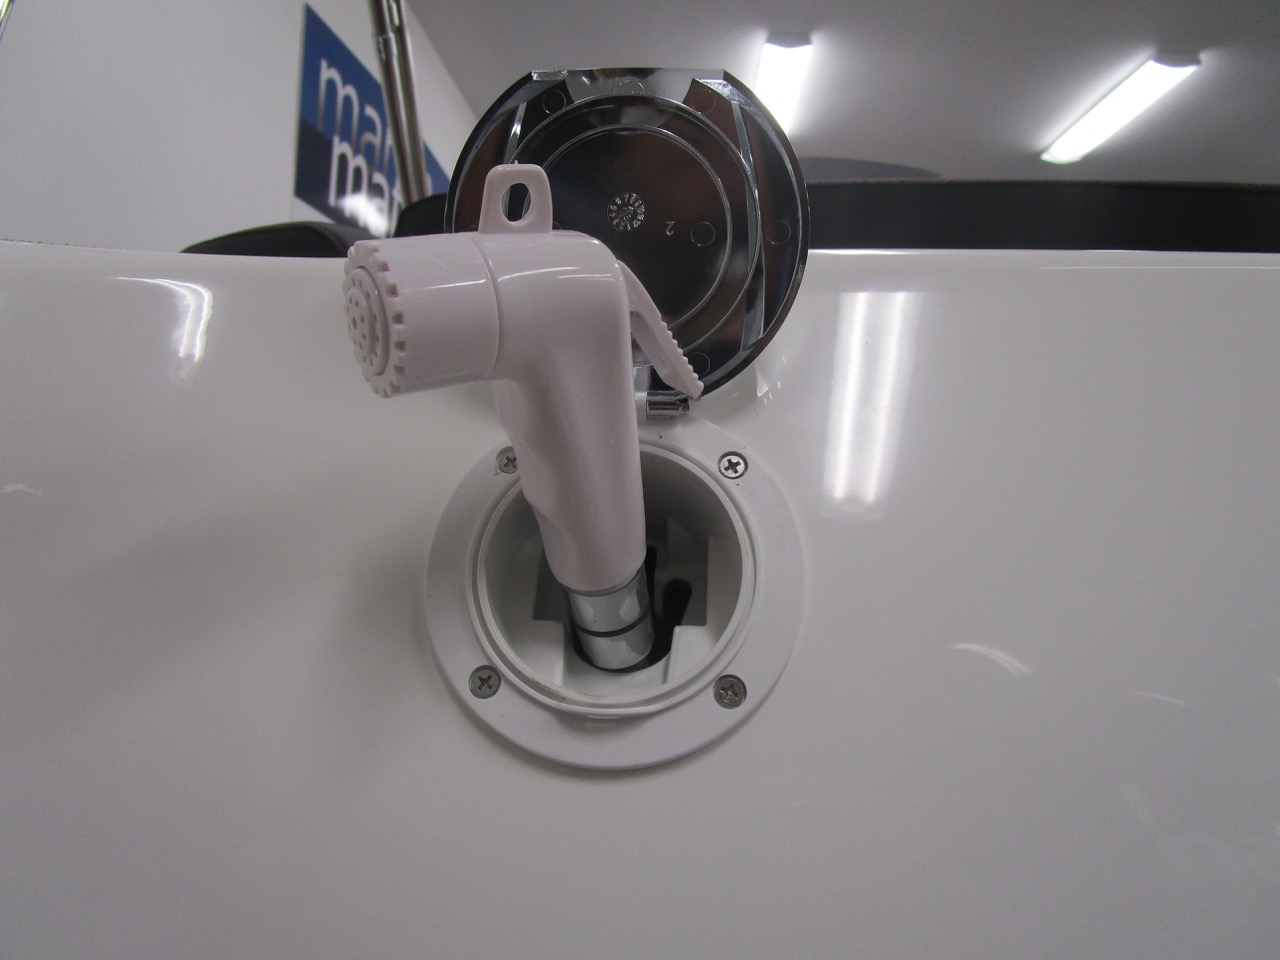 GRAND G850 RIB transom shower head